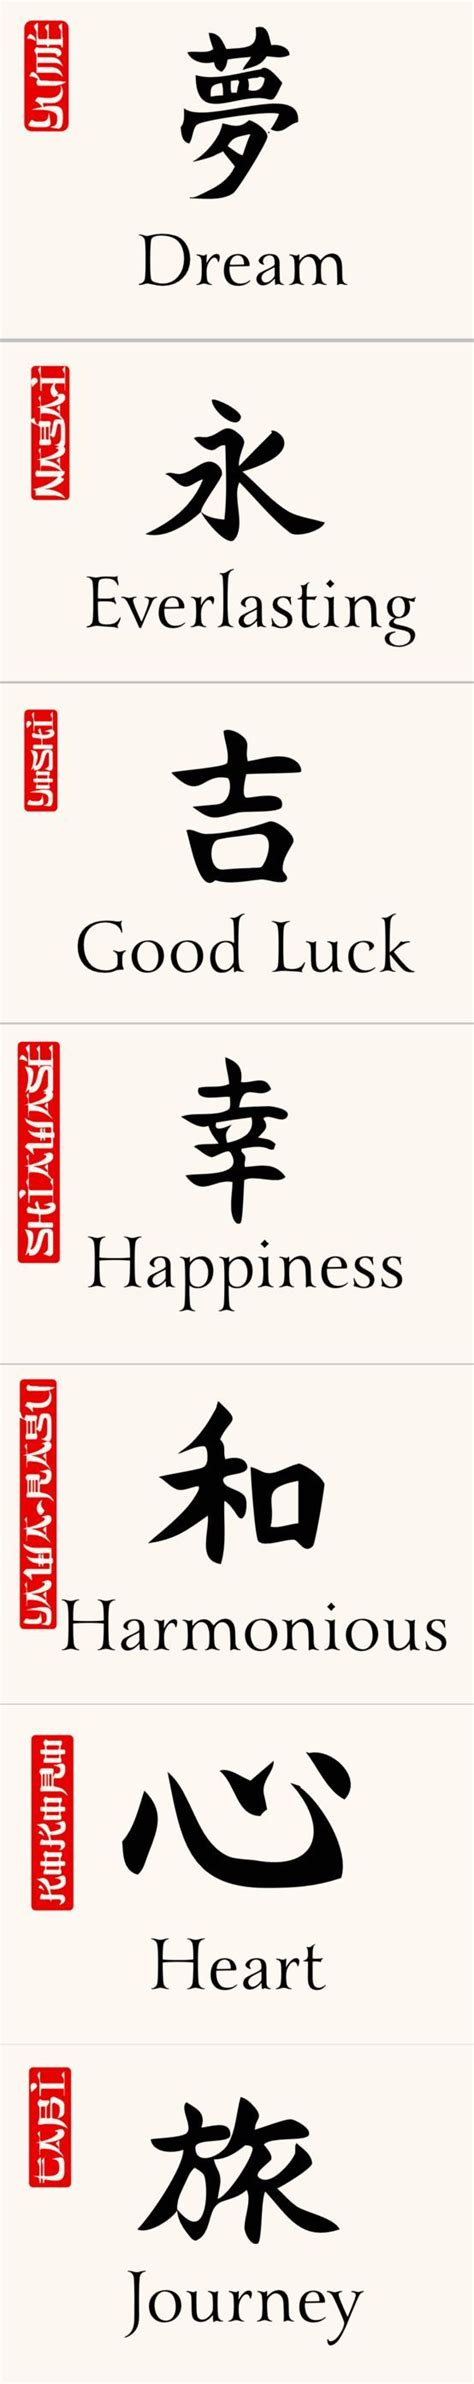 tattoo japanese fonts best 25 calligraphy ideas on pinterest handwriting